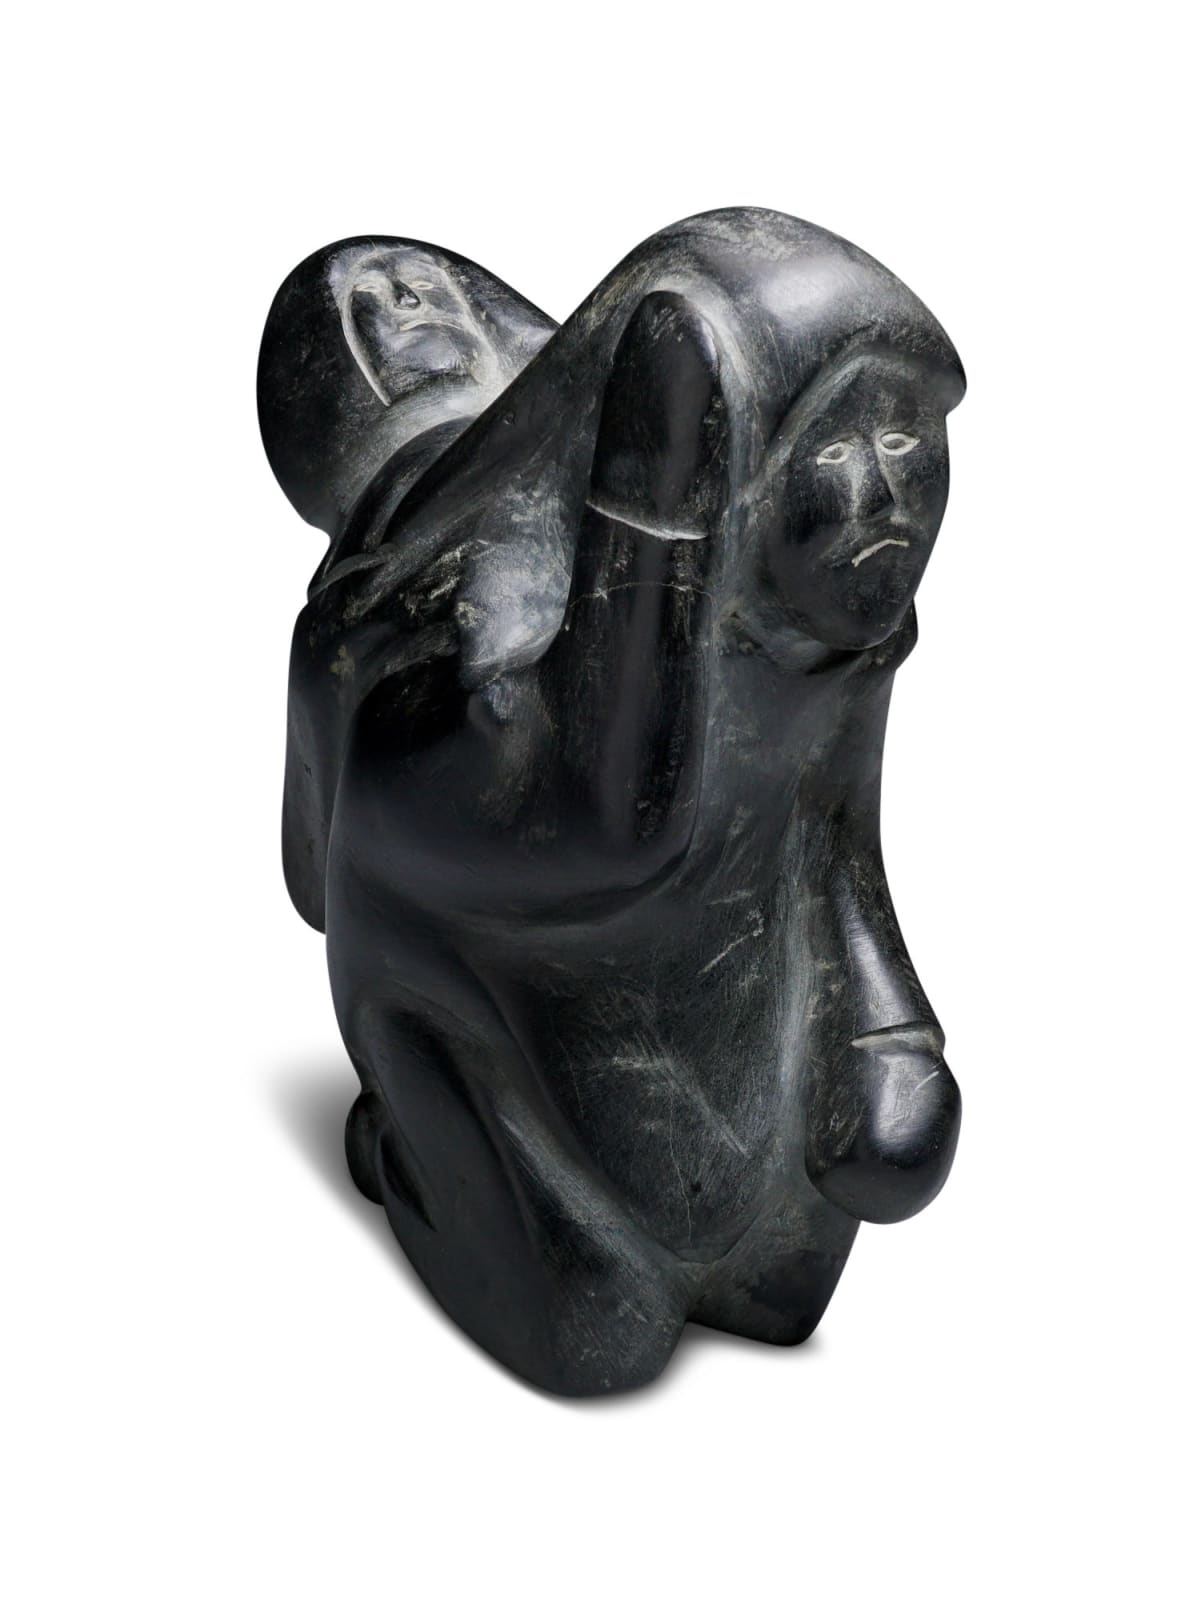 JACOB IRKOK (1937-2009) ARVIAT (ESKIMO POINT) Woeful Mother and Child, 1970 stone, 6 1/2 x 5 x 2 1/2 in (16.5 x 12.7 x 6.3 cm) ESTIMATE: $400 — $600 New Price: $300